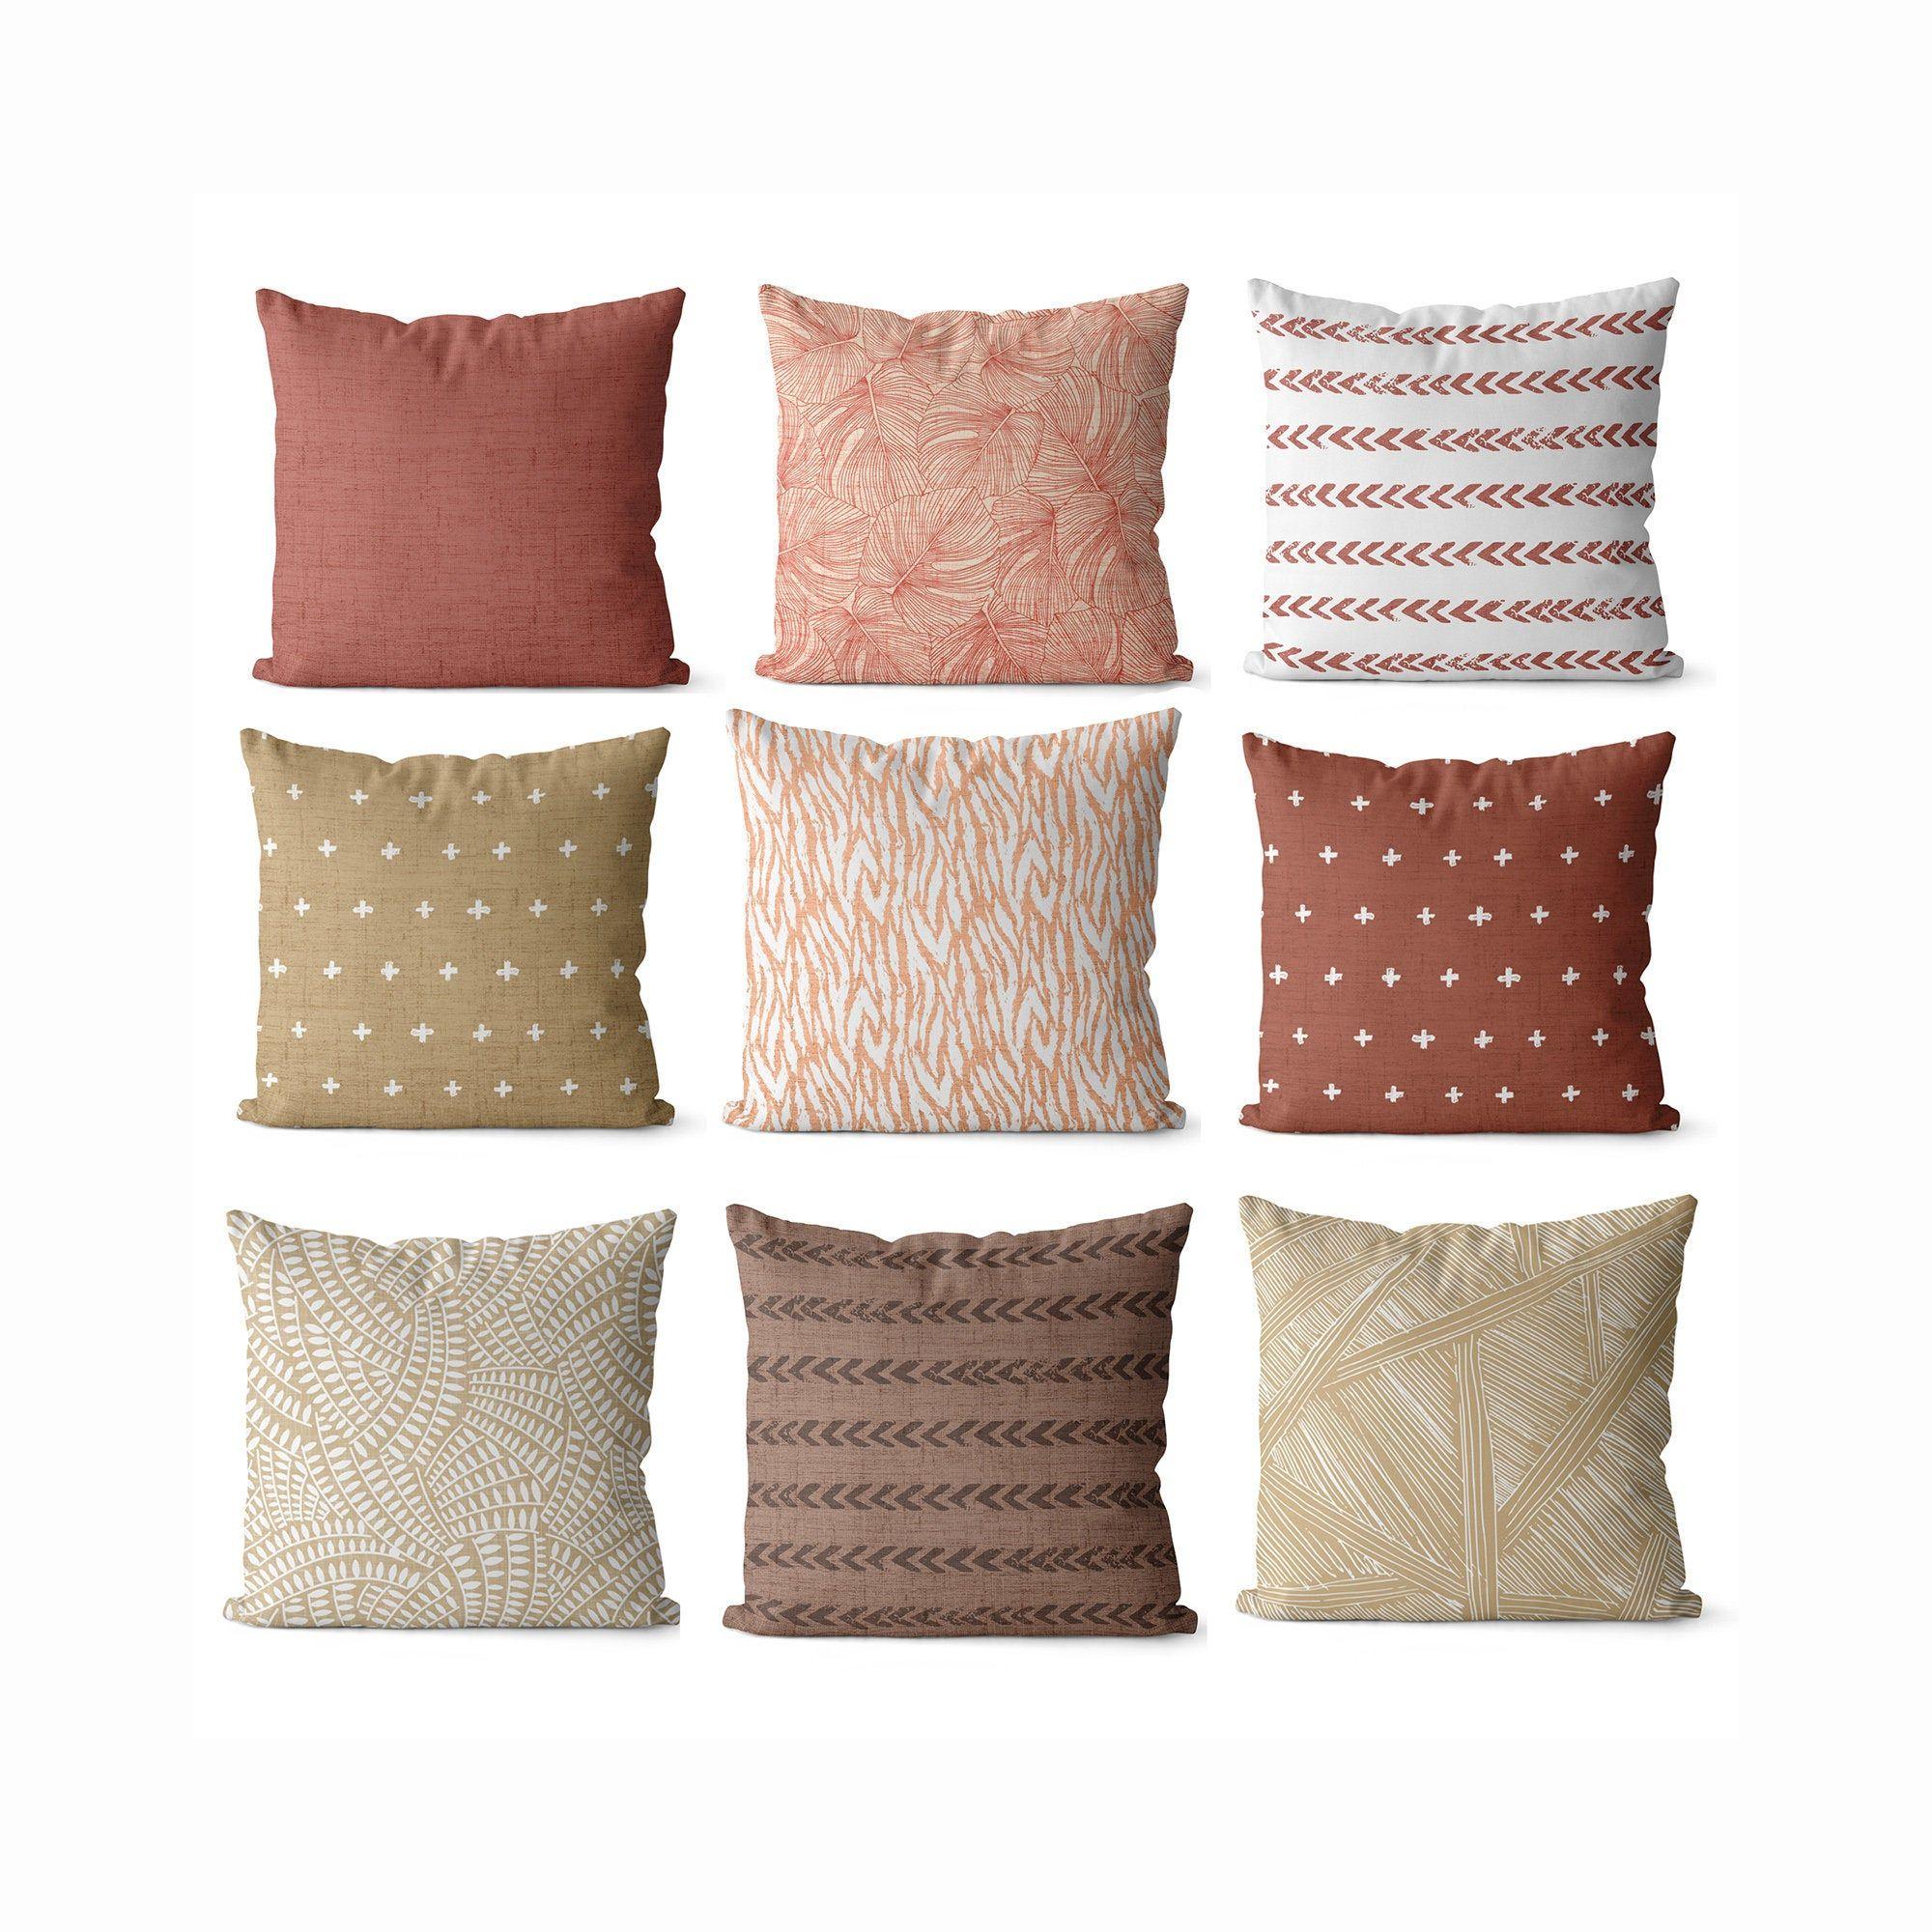 Boho Pillow Covers For Living Room Tan Pink Decor Boho Style Etsy In 2020 Boho Living Room Decor Pillow Covers Decorative Pillow Covers #pillow #covers #living #room